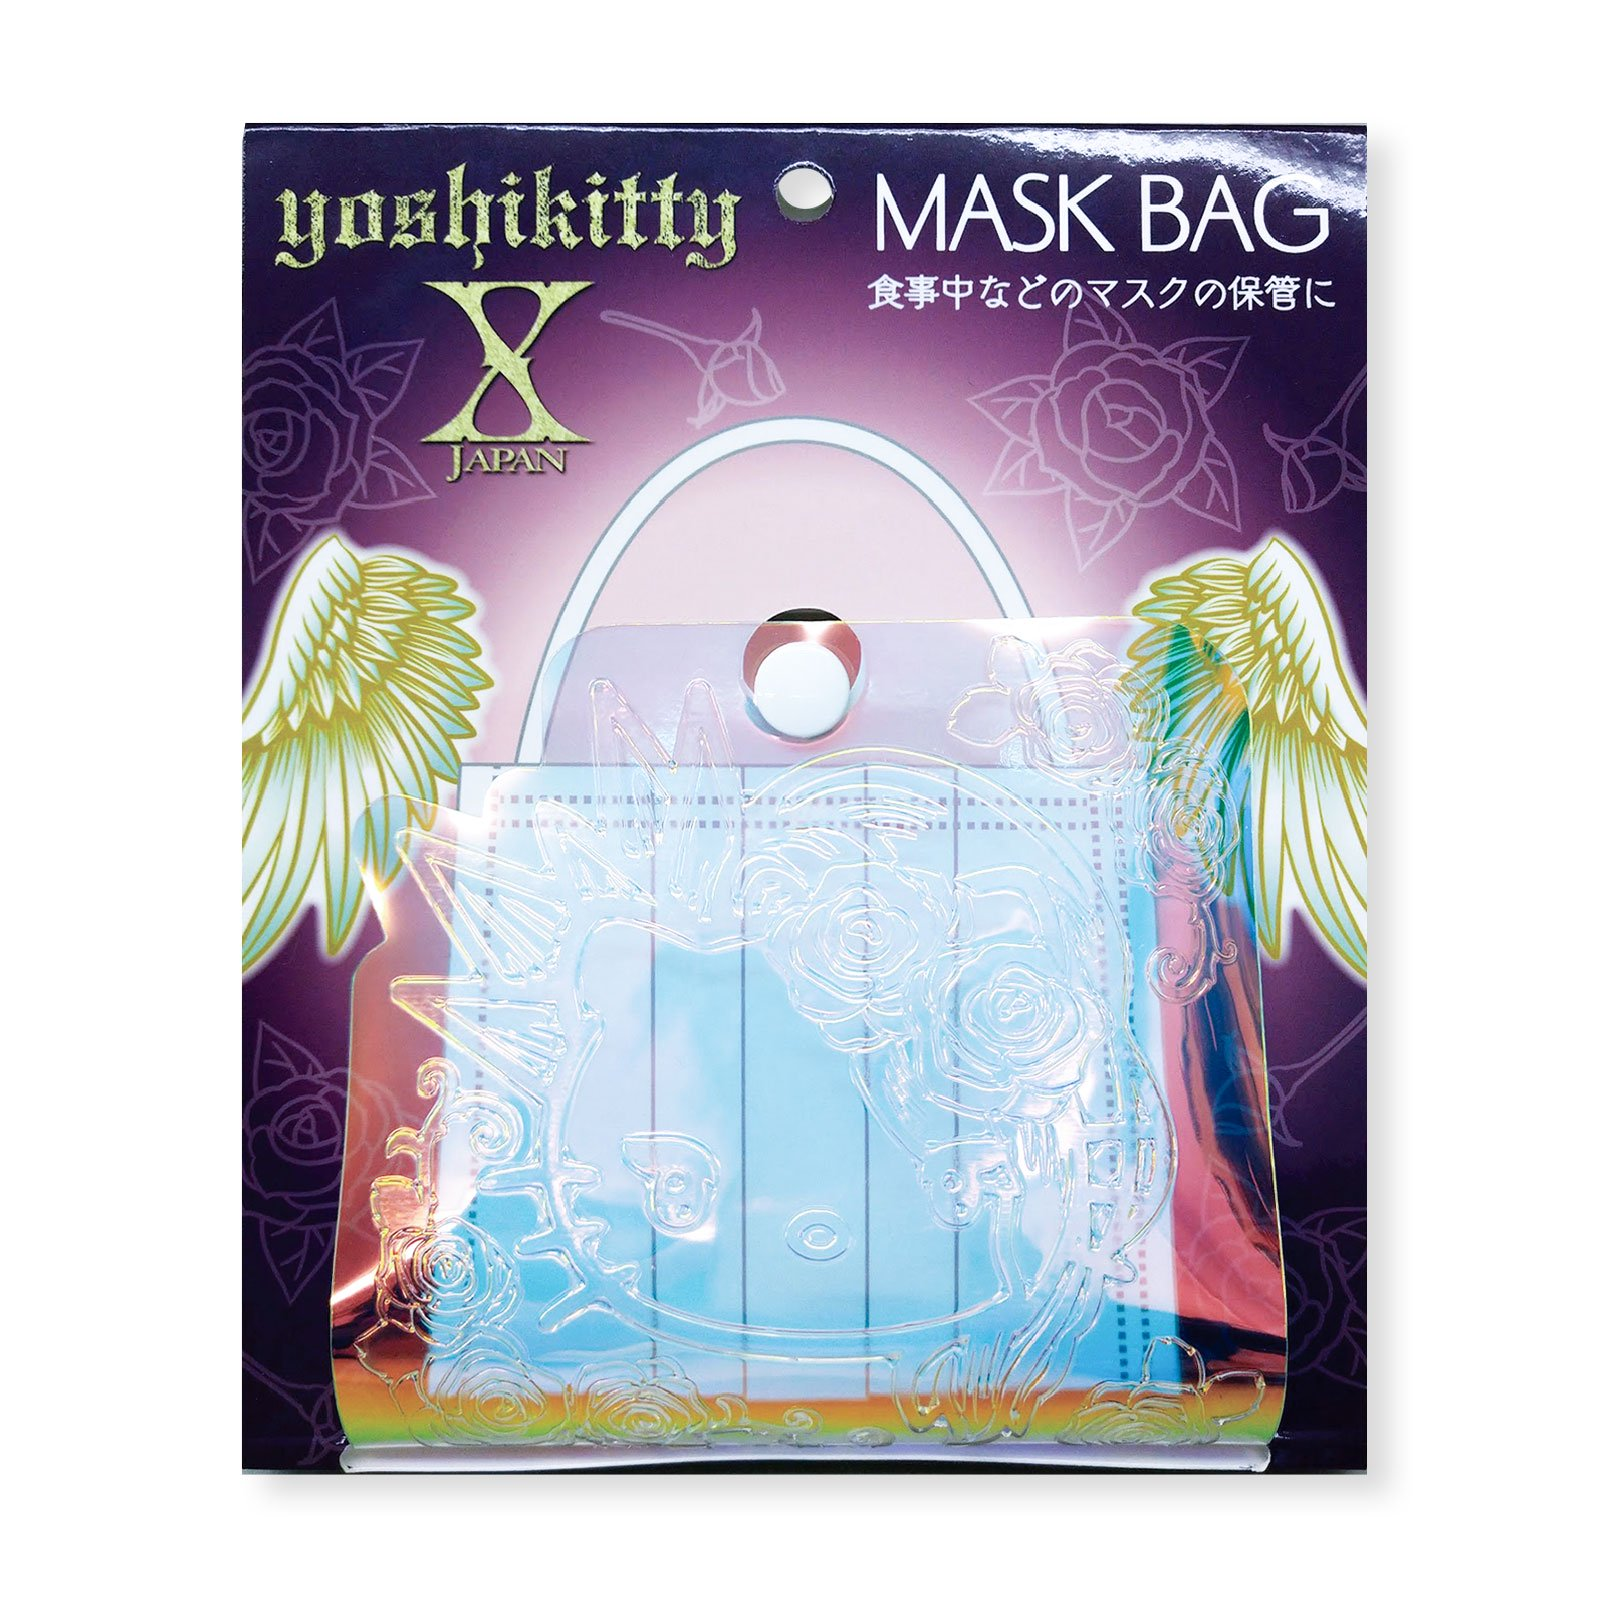 《web限定》yoshikitty:マスクバッグ・2021・翼